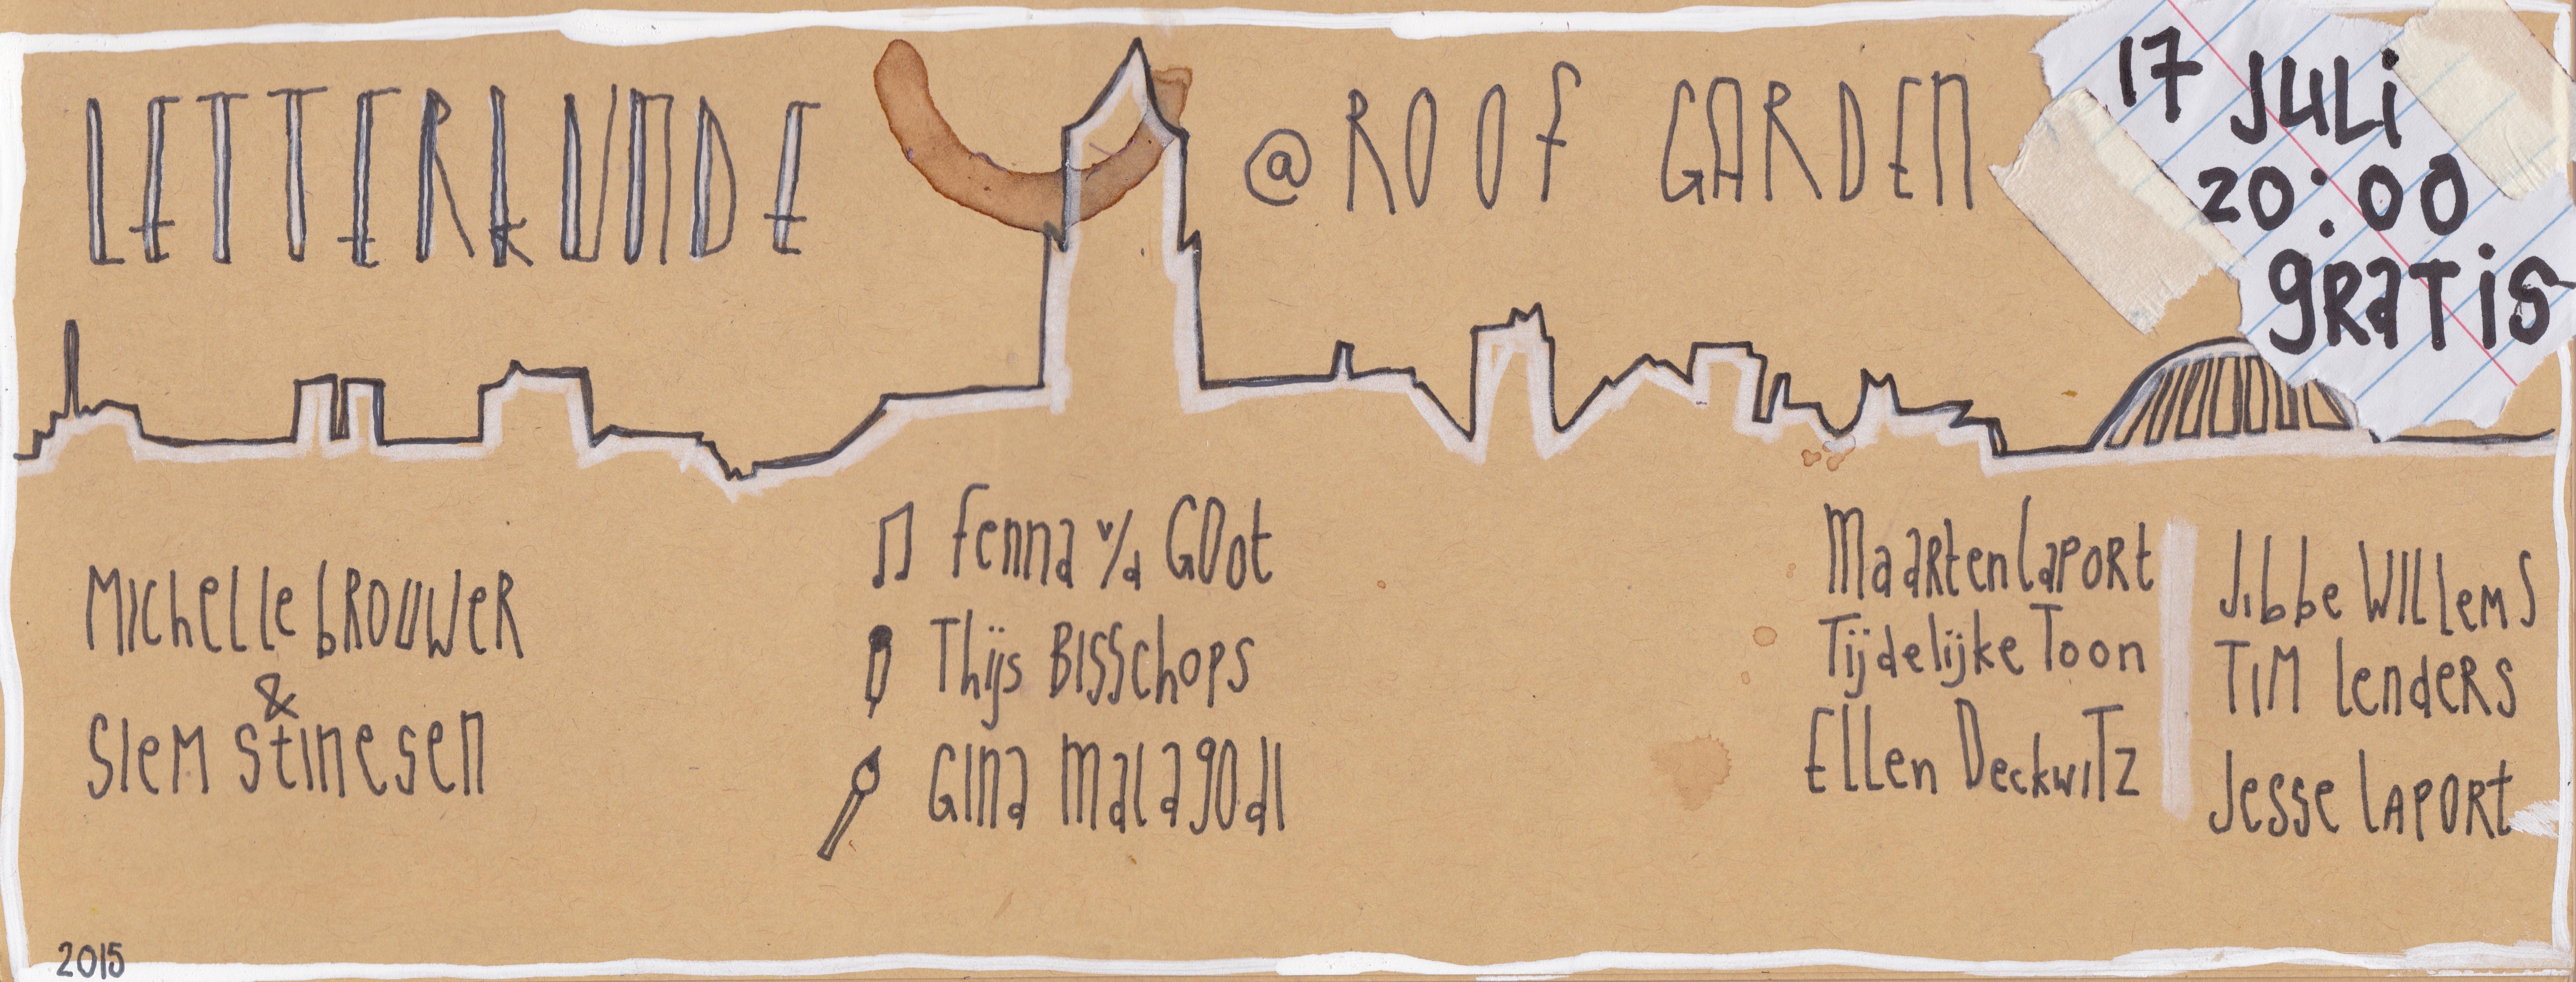 Poster horizontaal Letterkunde 17 juli Roof Garden